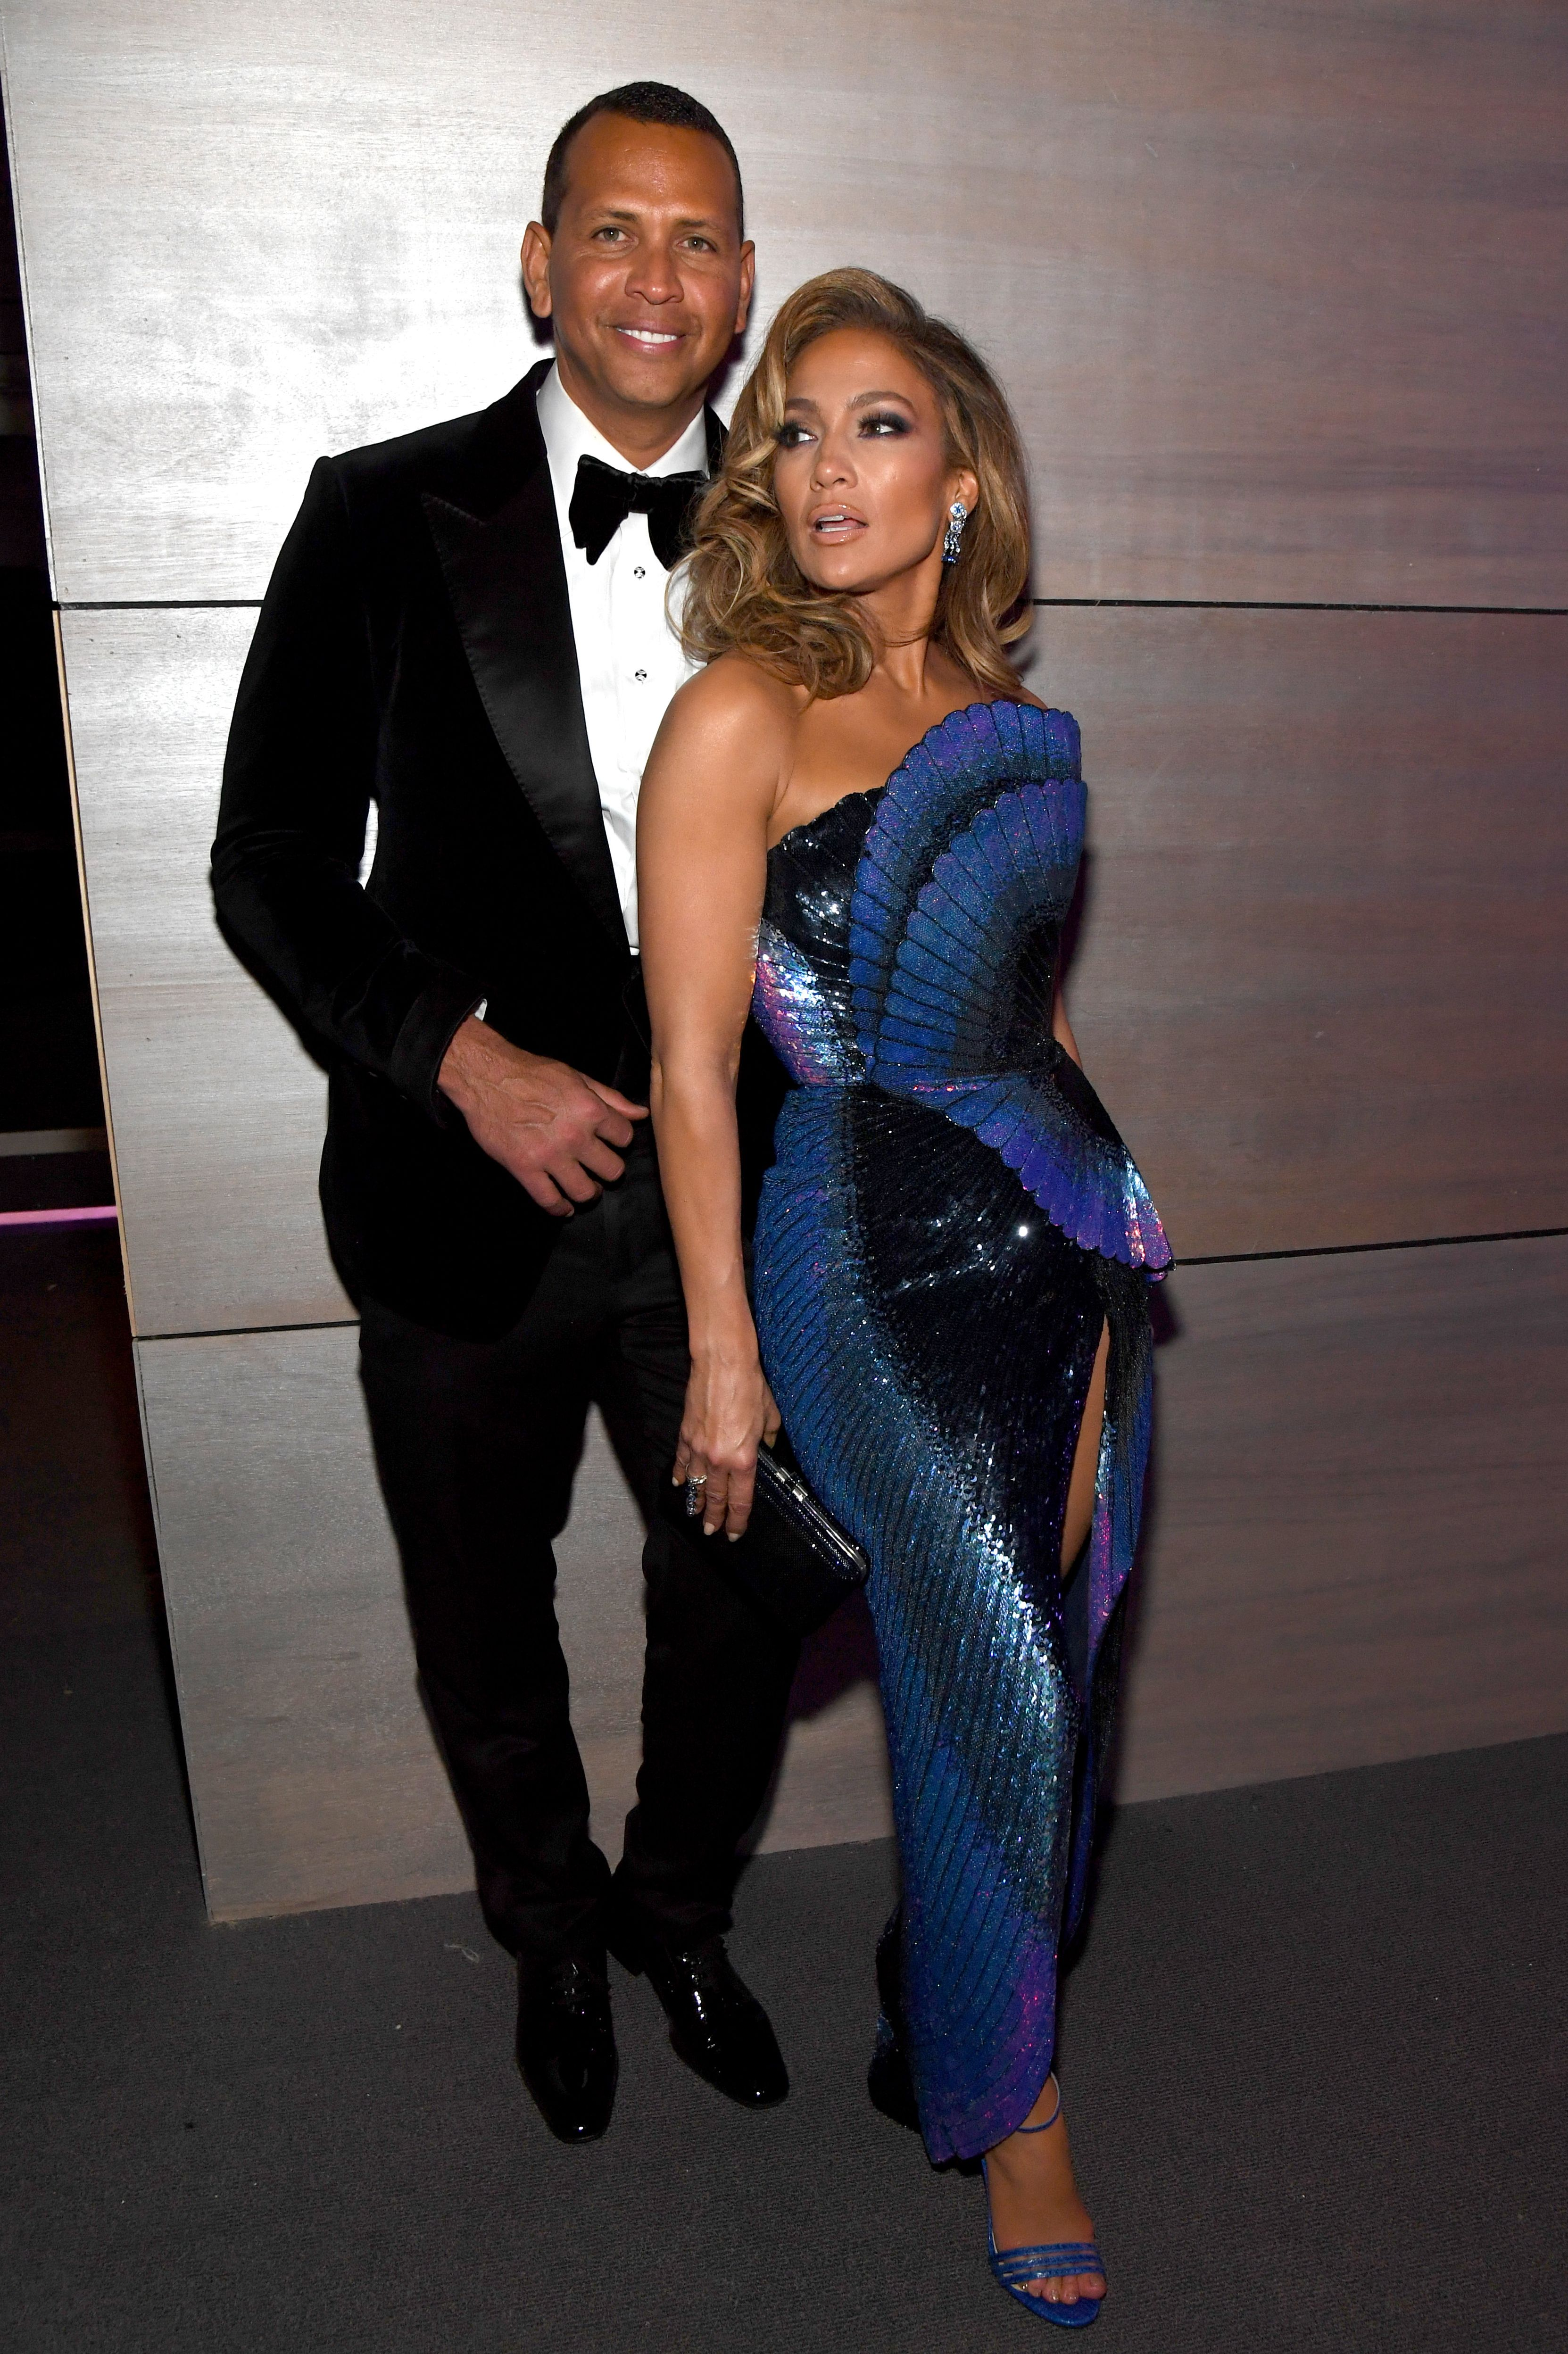 Jennifer Lopez and Alex Rodriguez at the Vanity Fair Oscars Party 2019